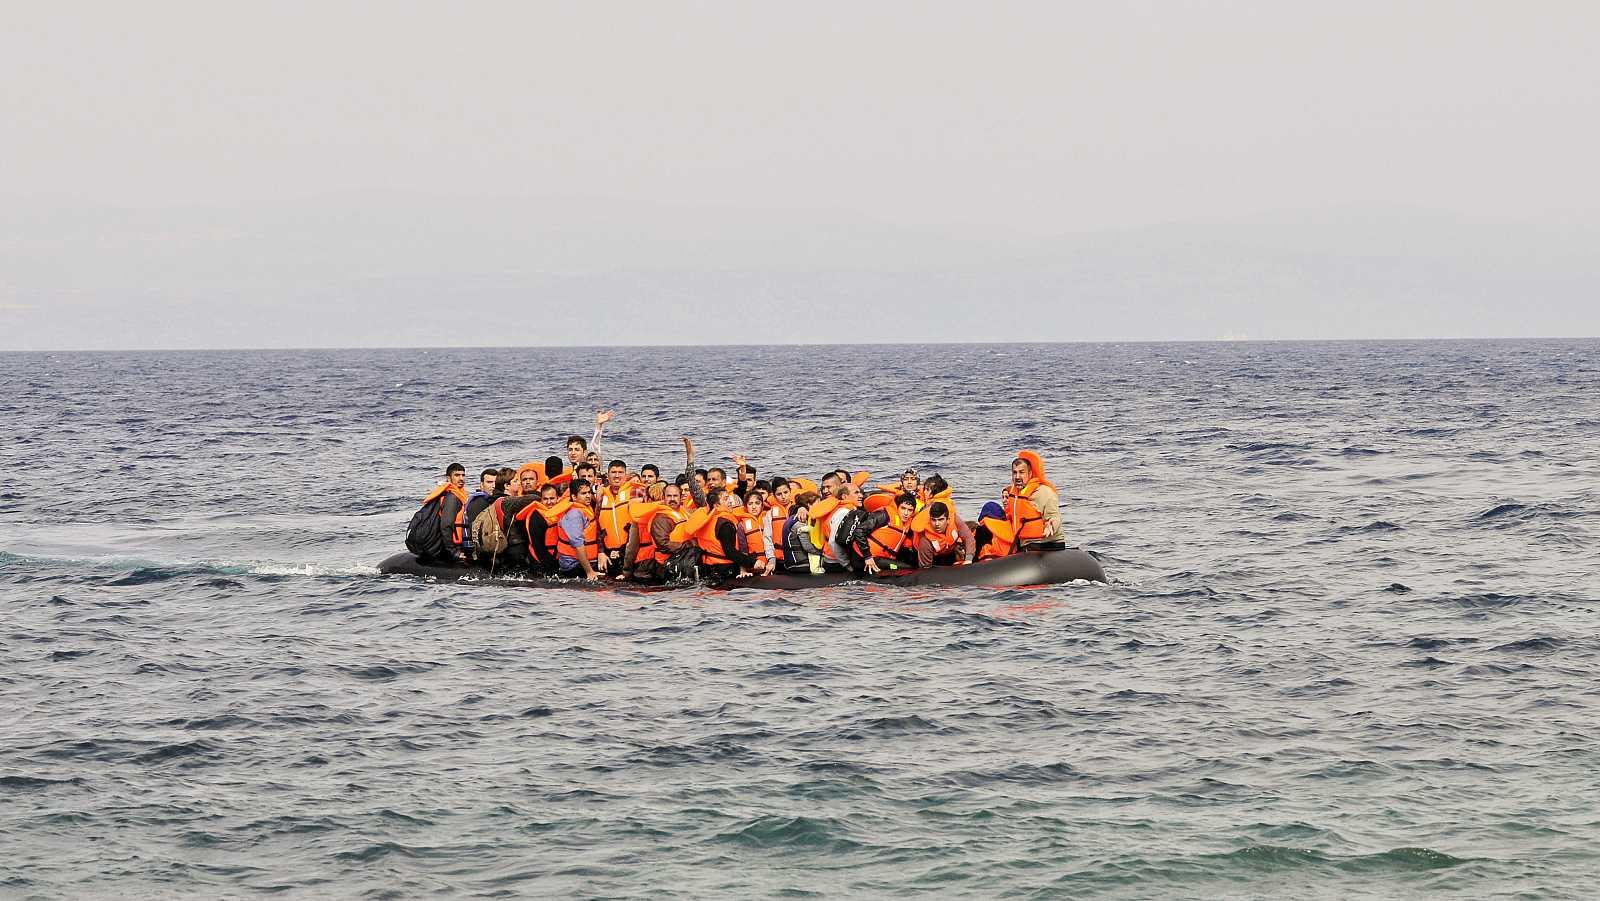 La ONG Open Arms rescata a 83 migrantes en el Mediterráneo Central.